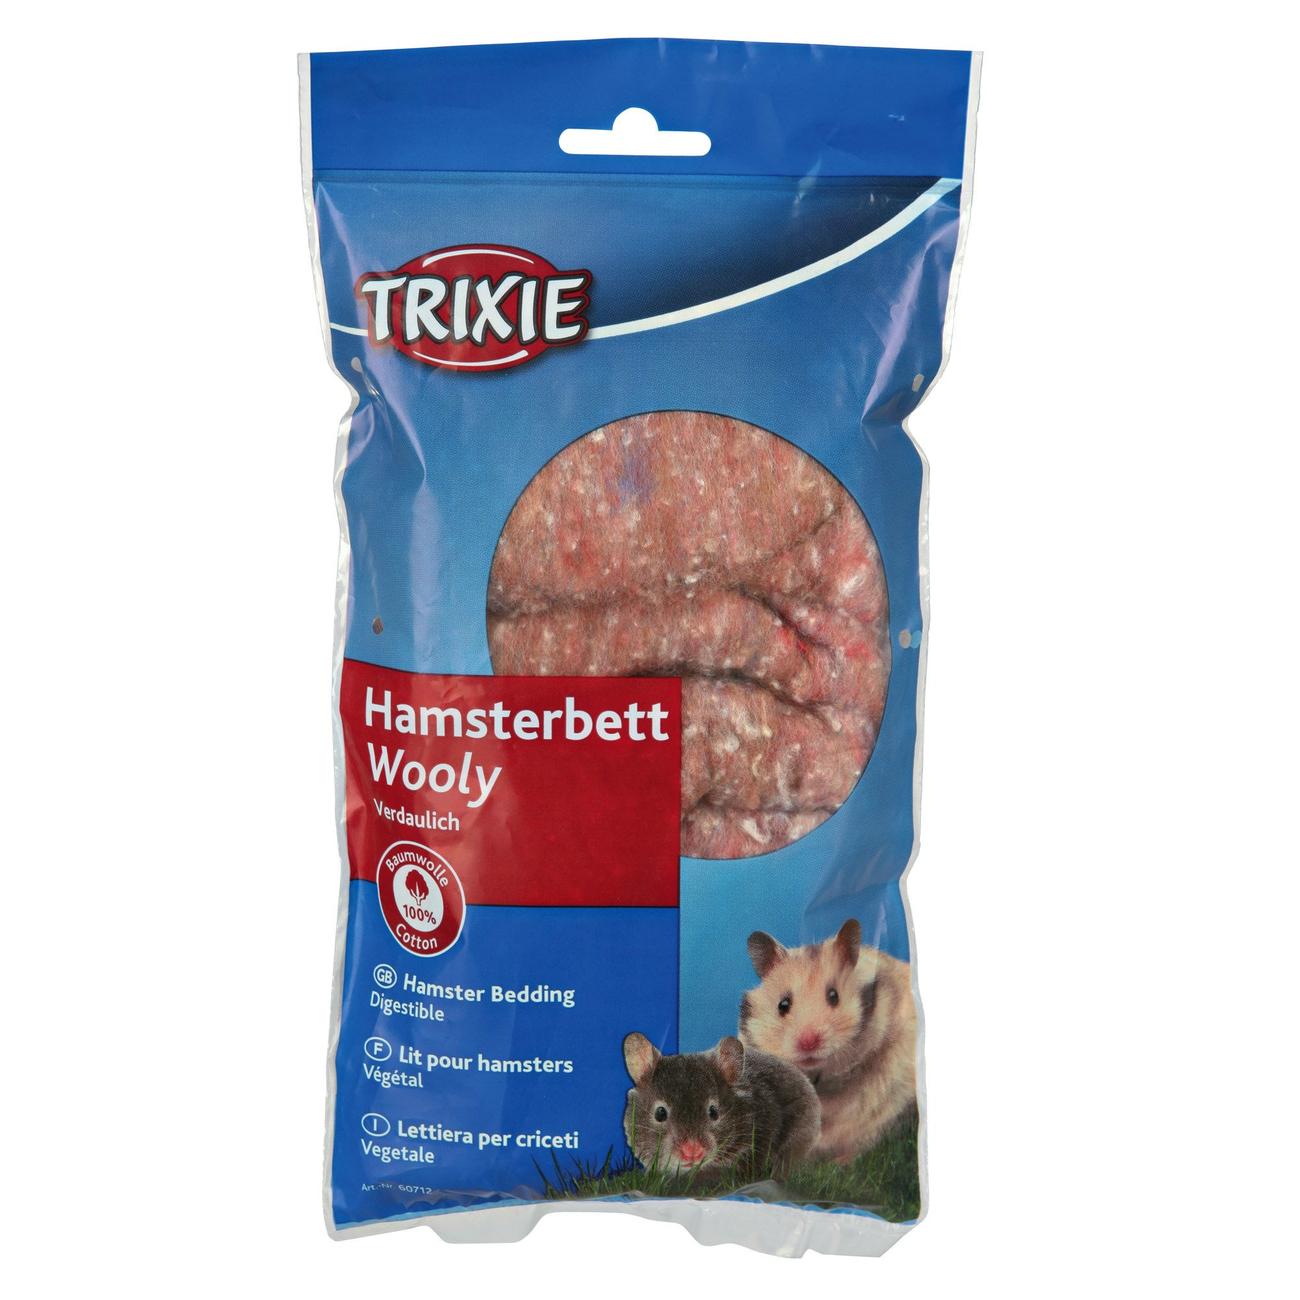 "TRIXIE ""Wooly"" Hamsterbett 6038, Bild 4"